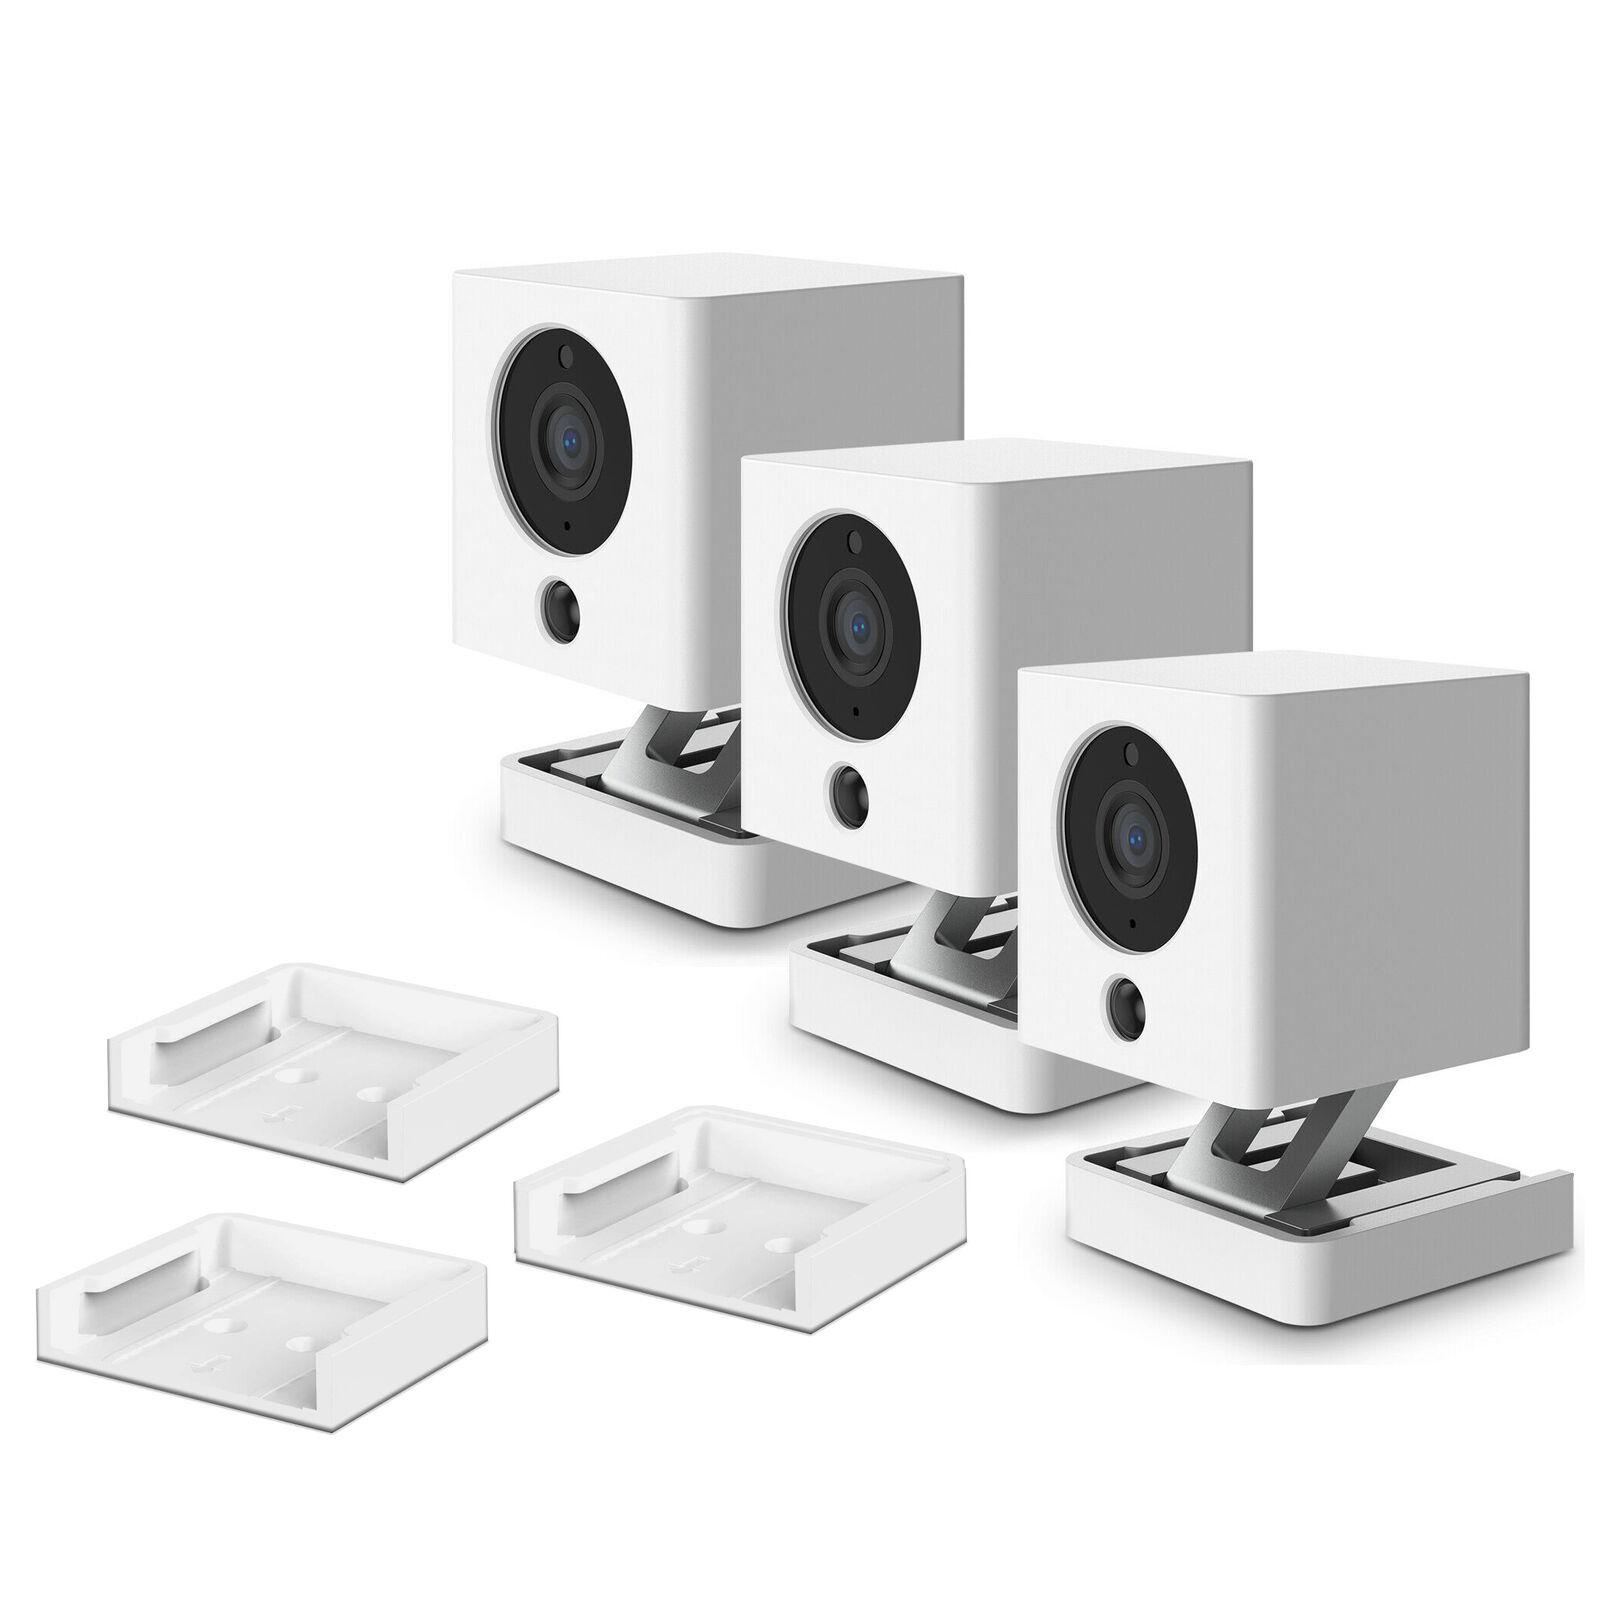 HOLACA Silicone Skins for Neos SmartCam/Wyze Cam V2 with Wall Ceiling Mounts